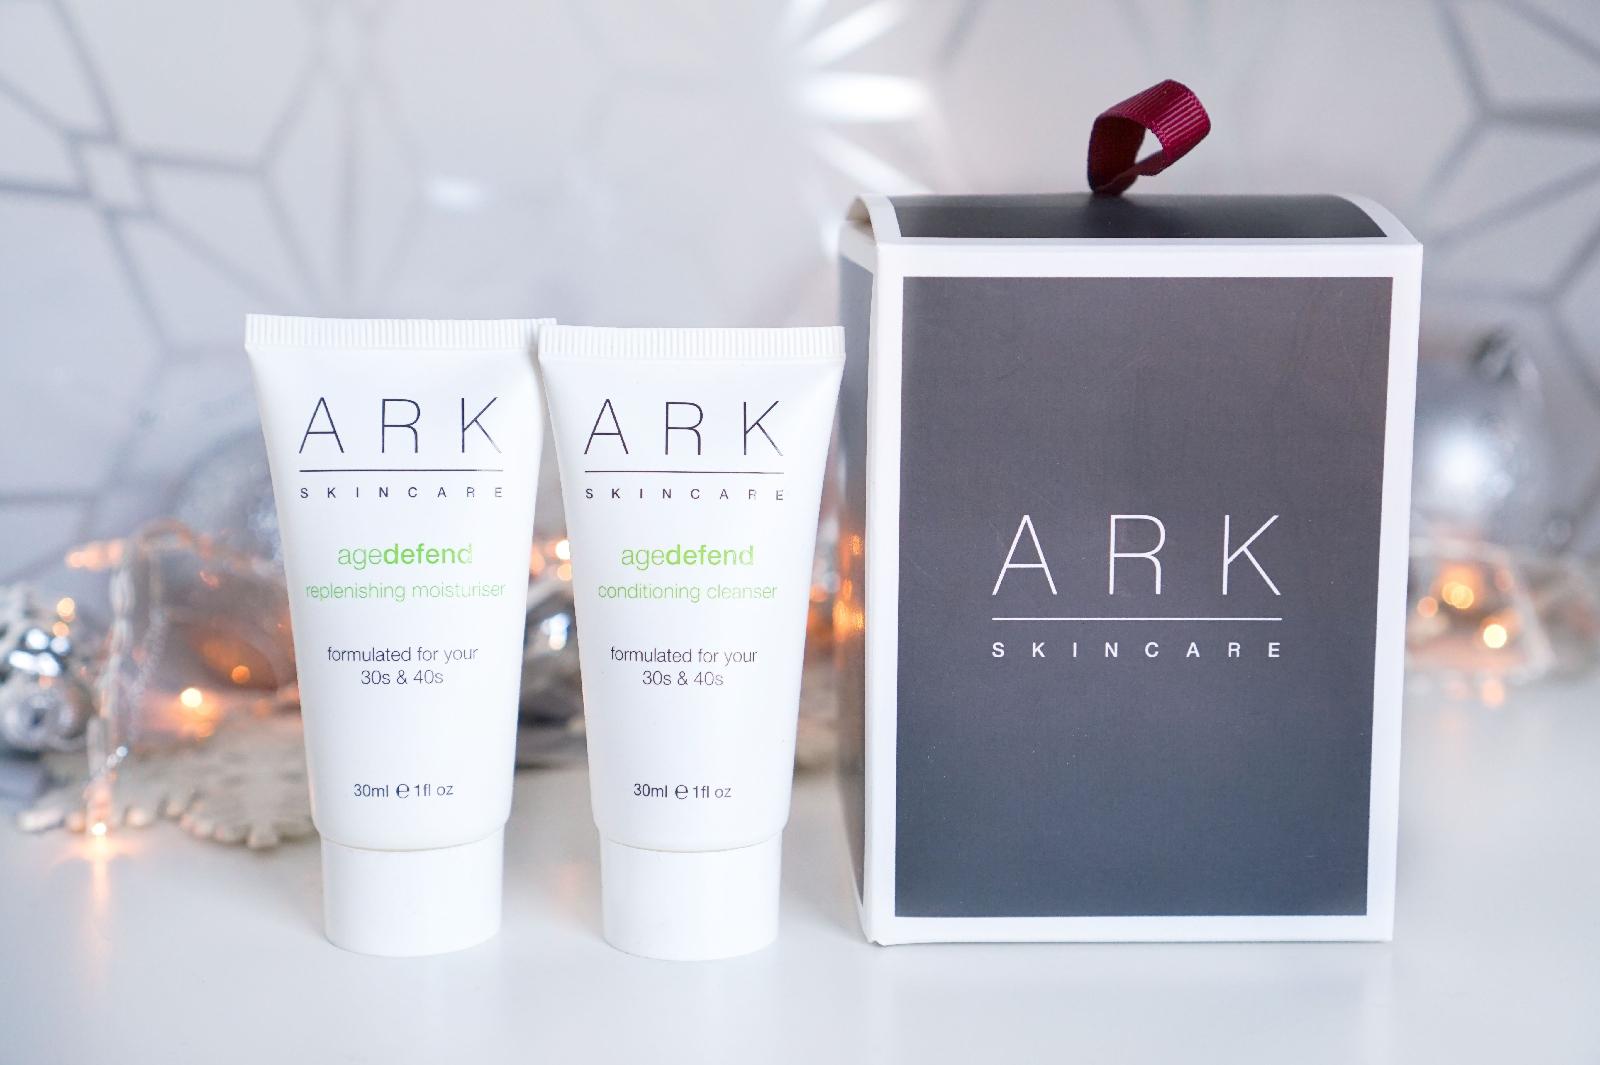 ARK Skincare Age Defend Stocking Filler